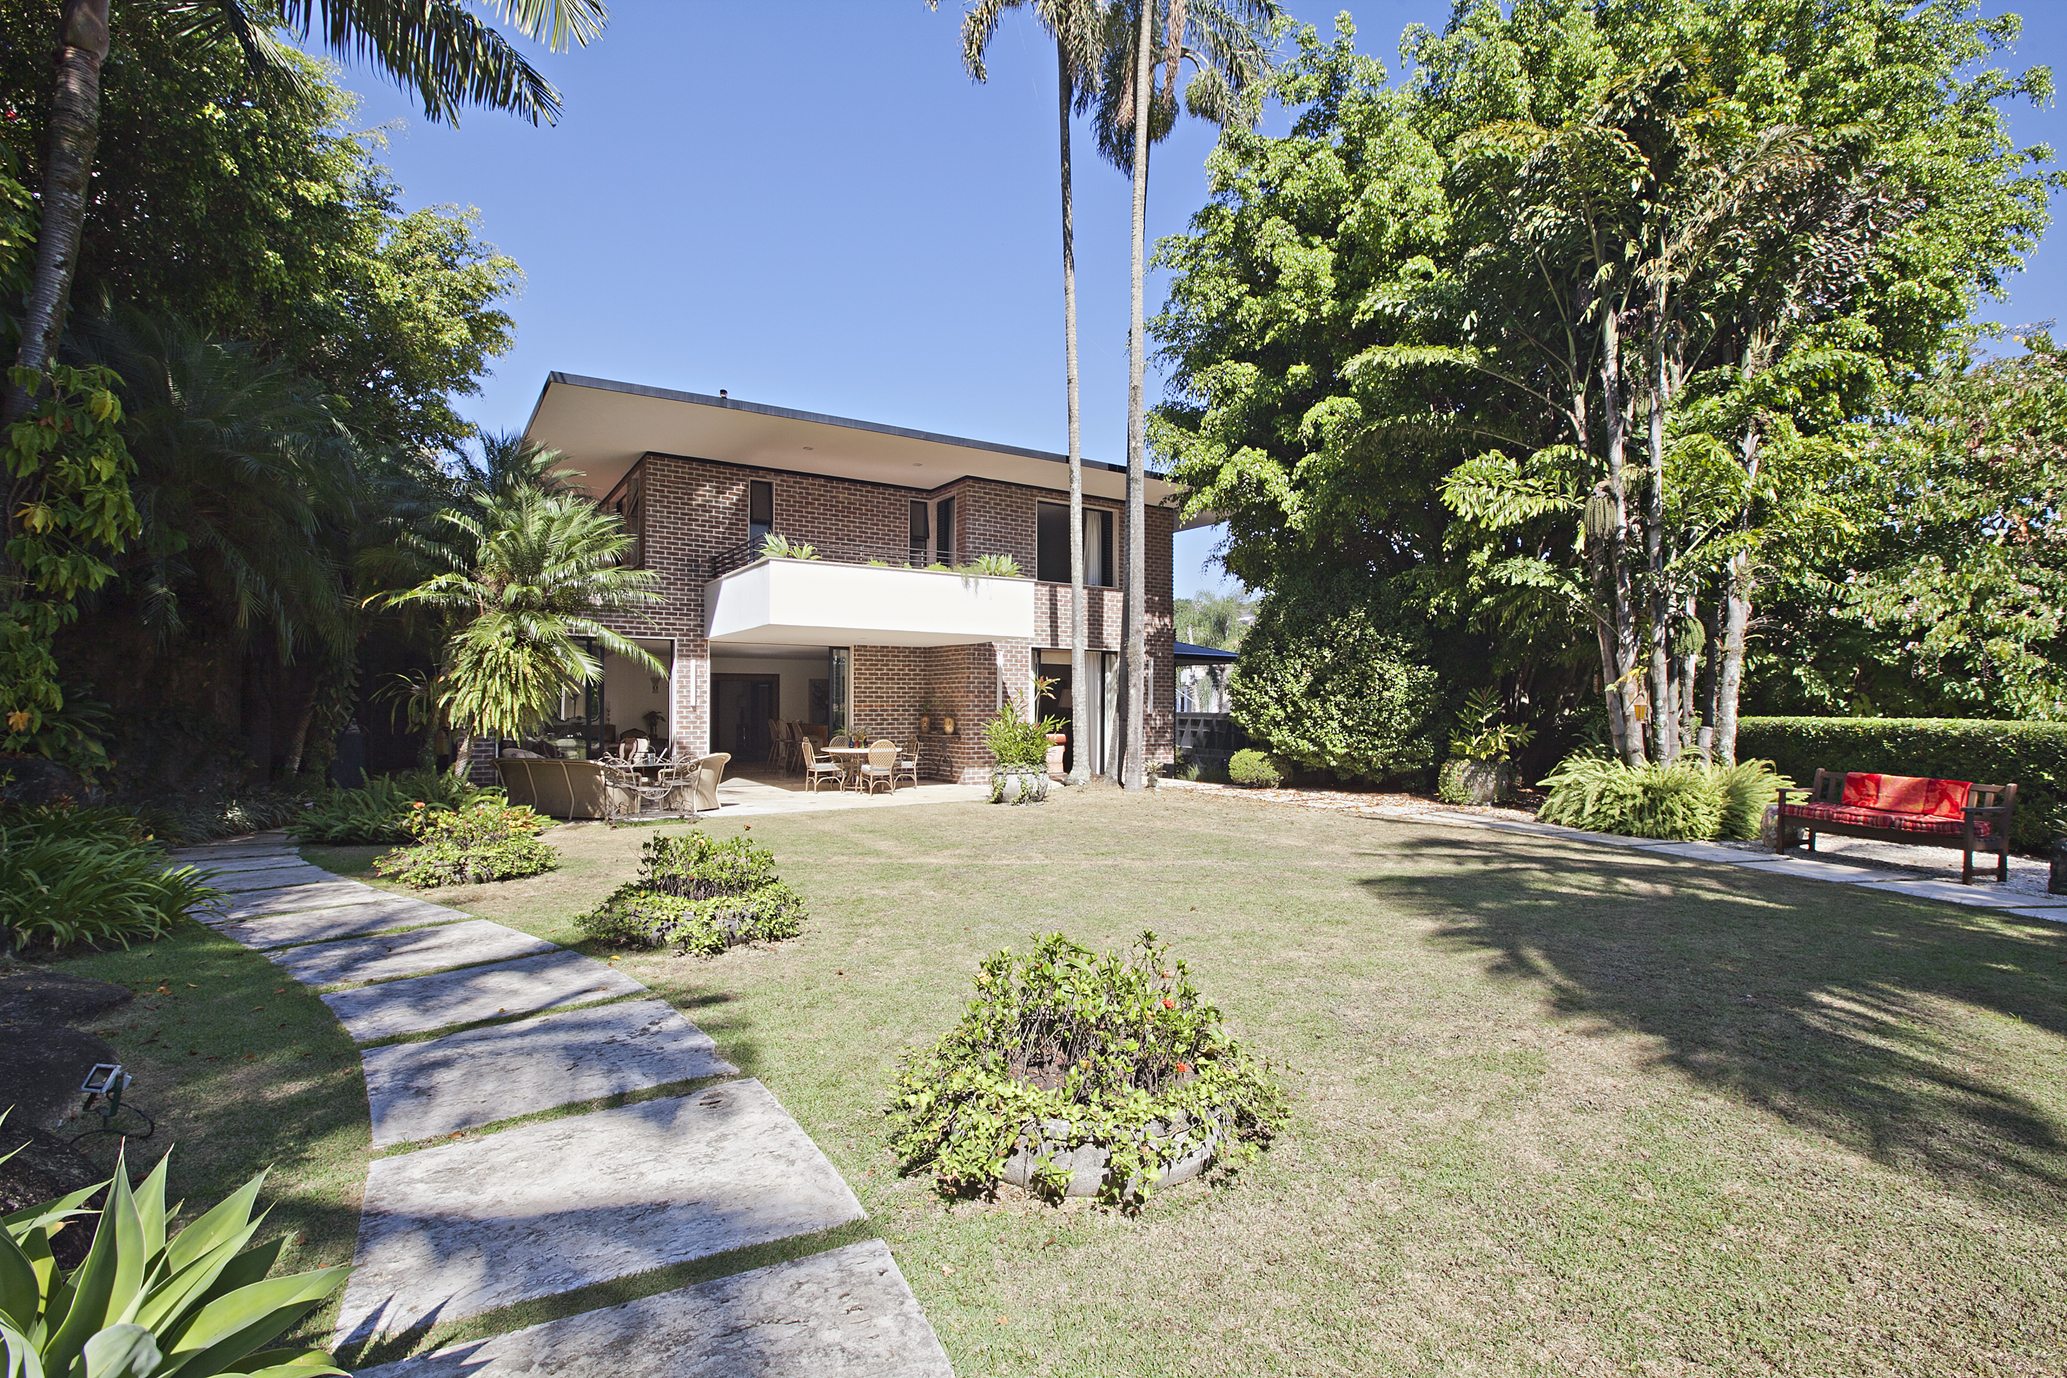 Einfamilienhaus für Verkauf beim Nice tranquil home Rua das Açucenas Sao Paulo, Sao Paulo, 05673040 Brasilien